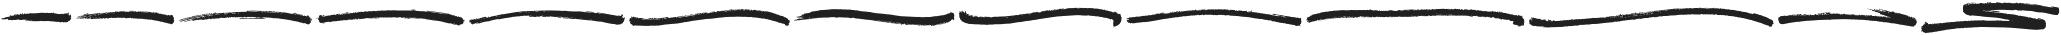 Manksa Swash otf (400) Font LOWERCASE